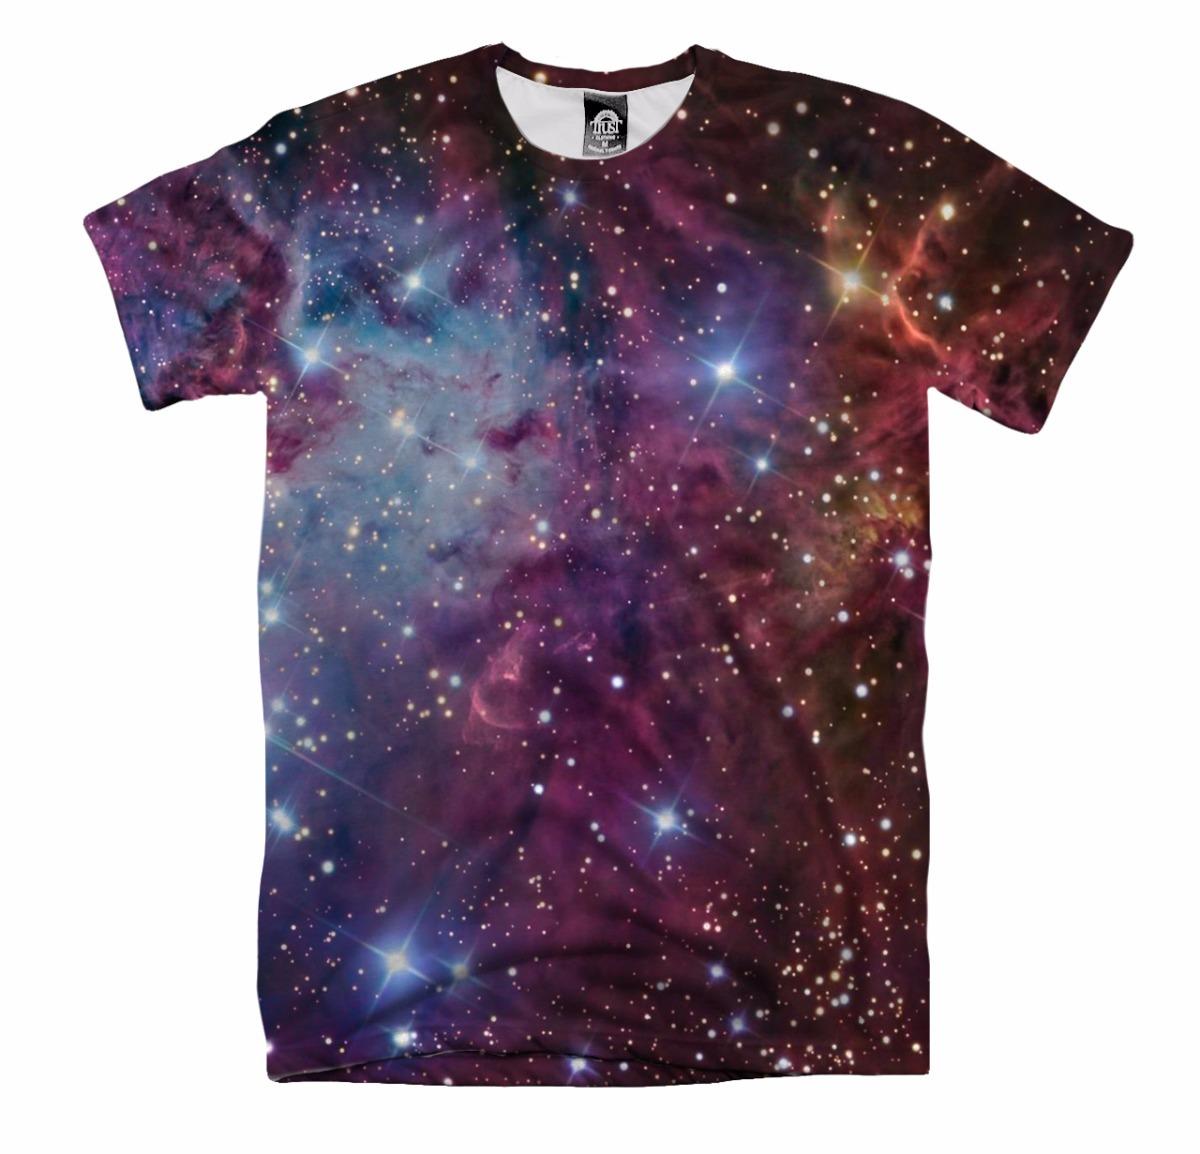 101c1580c8 camiseta masculina galaxia swag tumblr space nebulosa galaxy. Carregando  zoom.